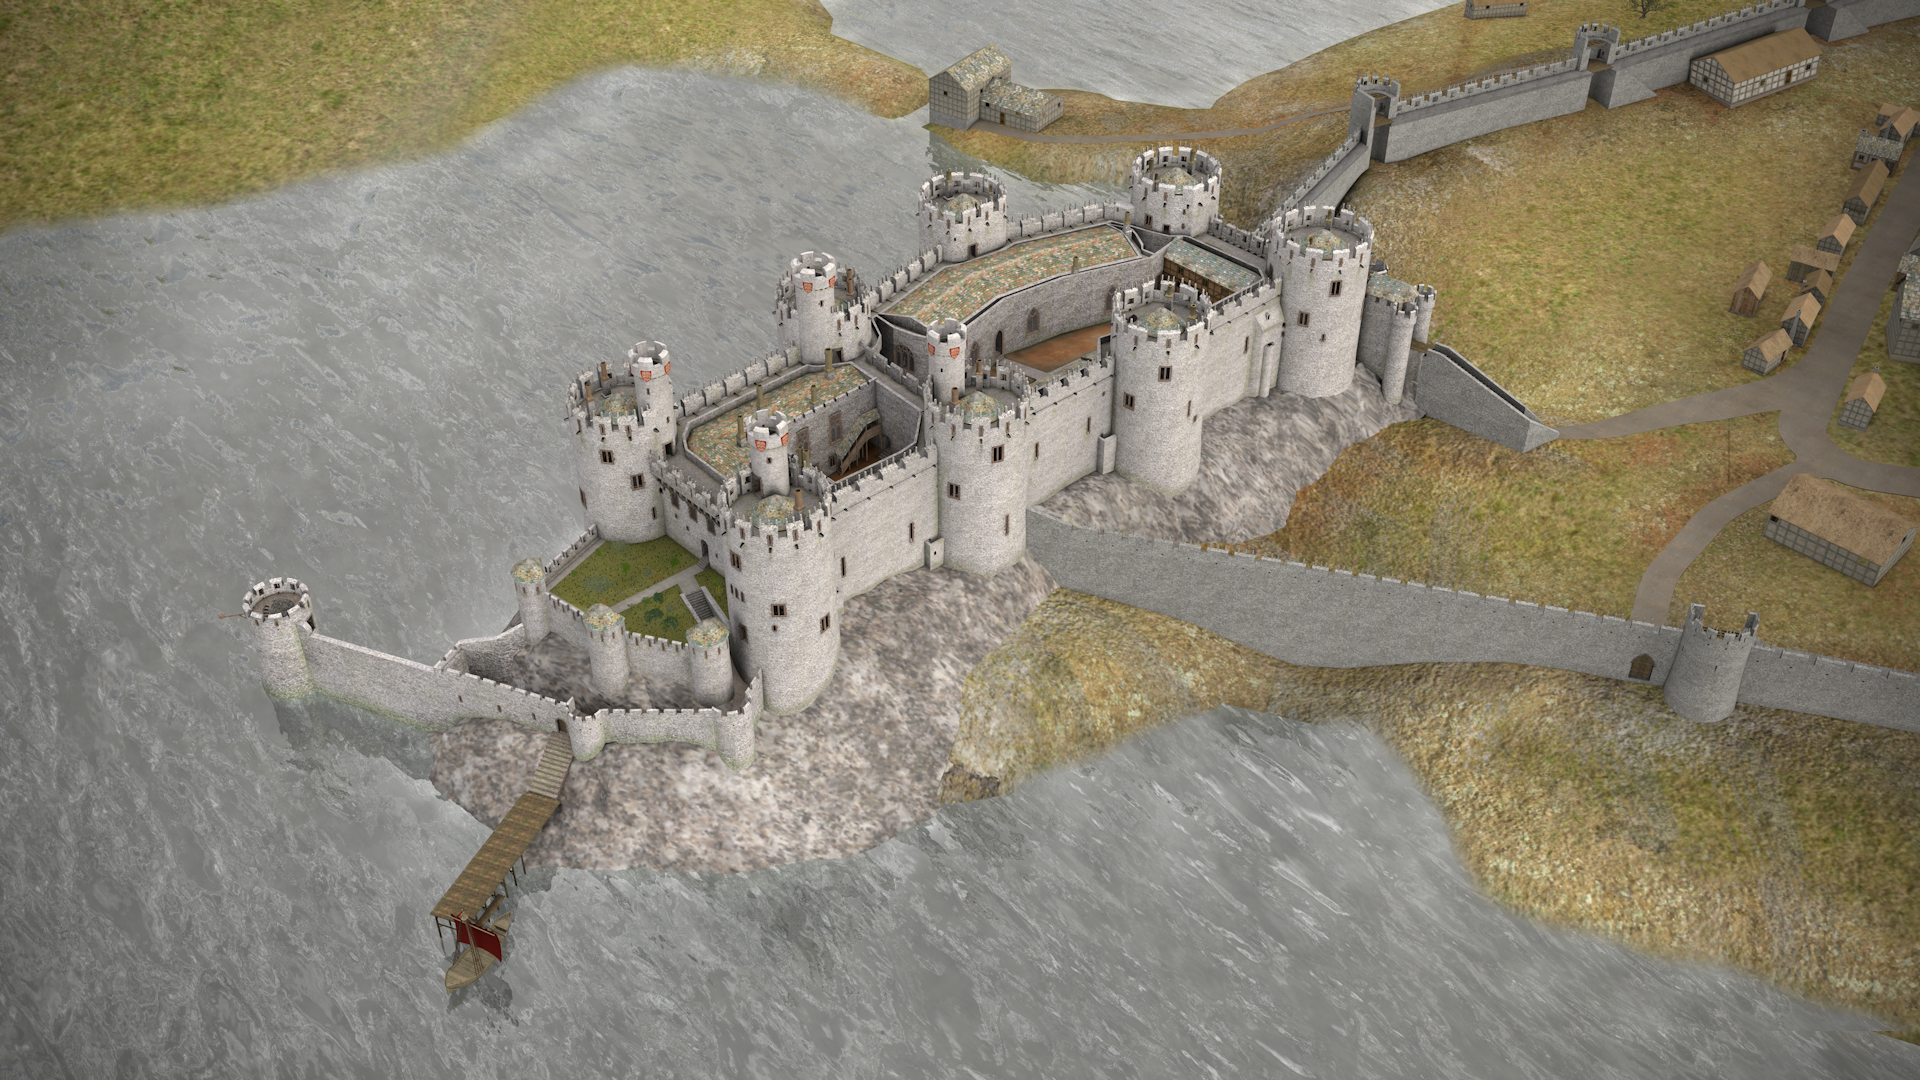 Castle Wide 01 frame0226.jpg